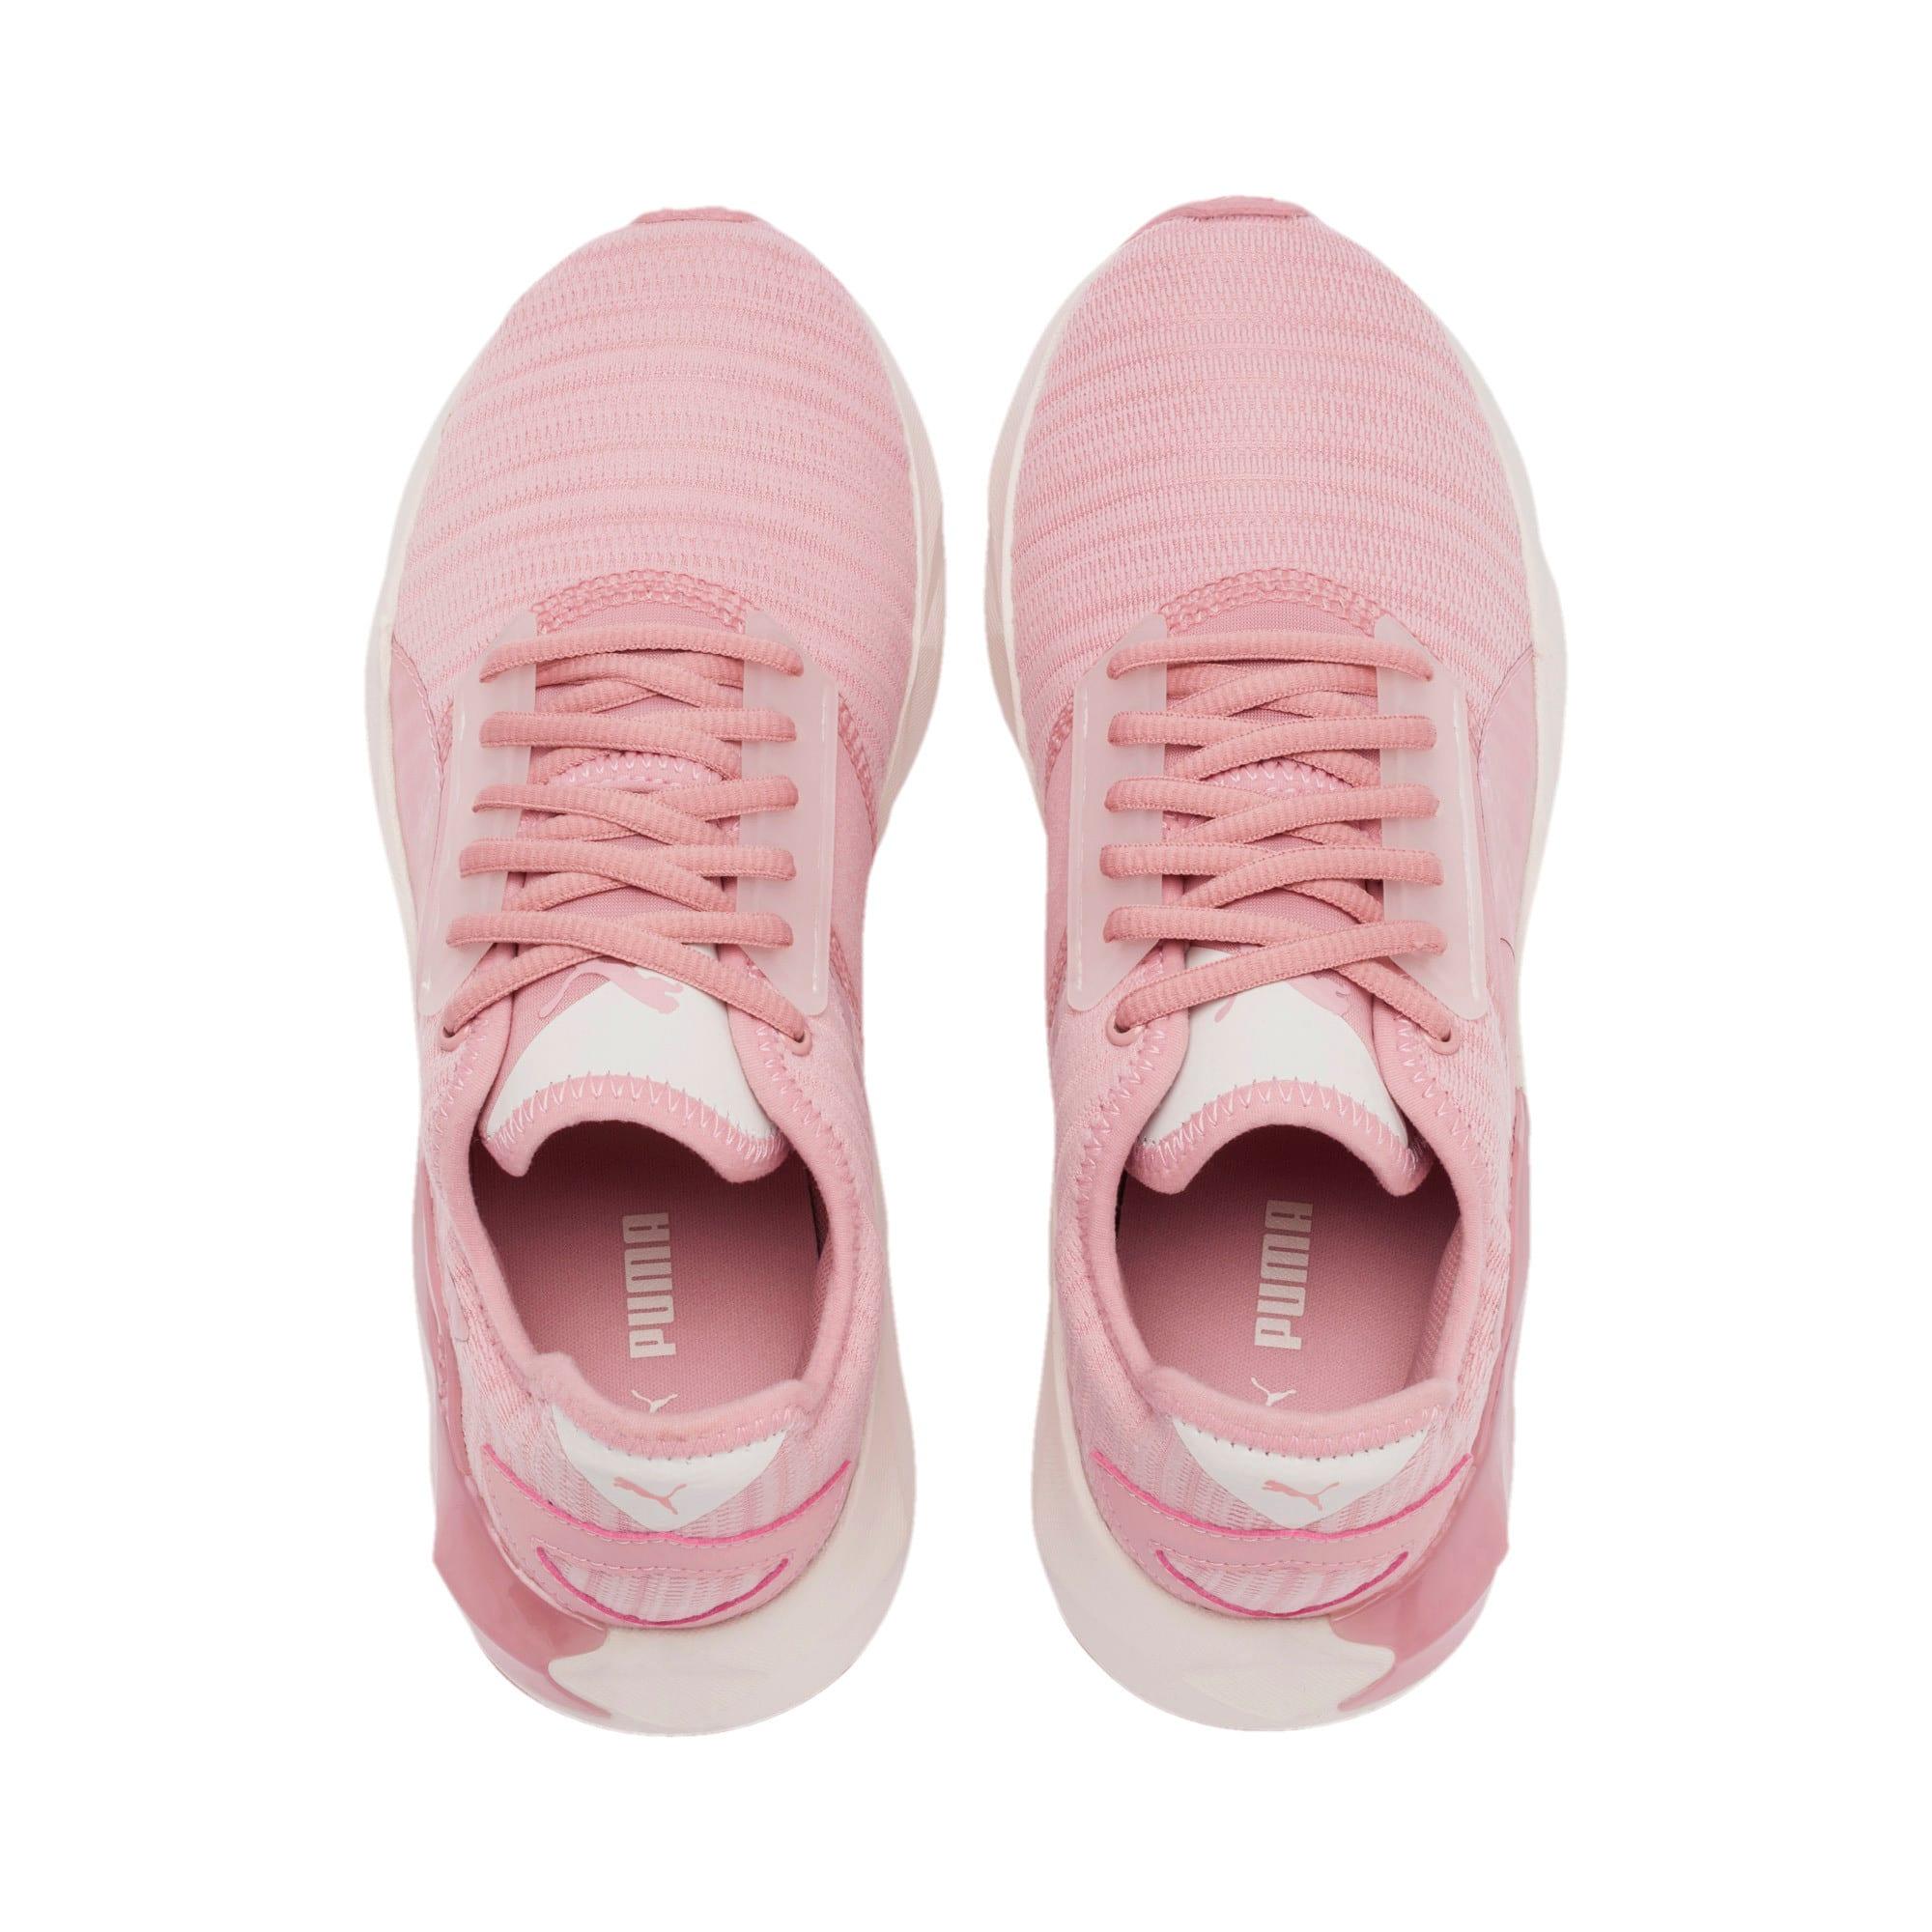 Thumbnail 7 of CELL Plasmic Women's Training Shoes, Bridal Rose-Pastel Parchment, medium